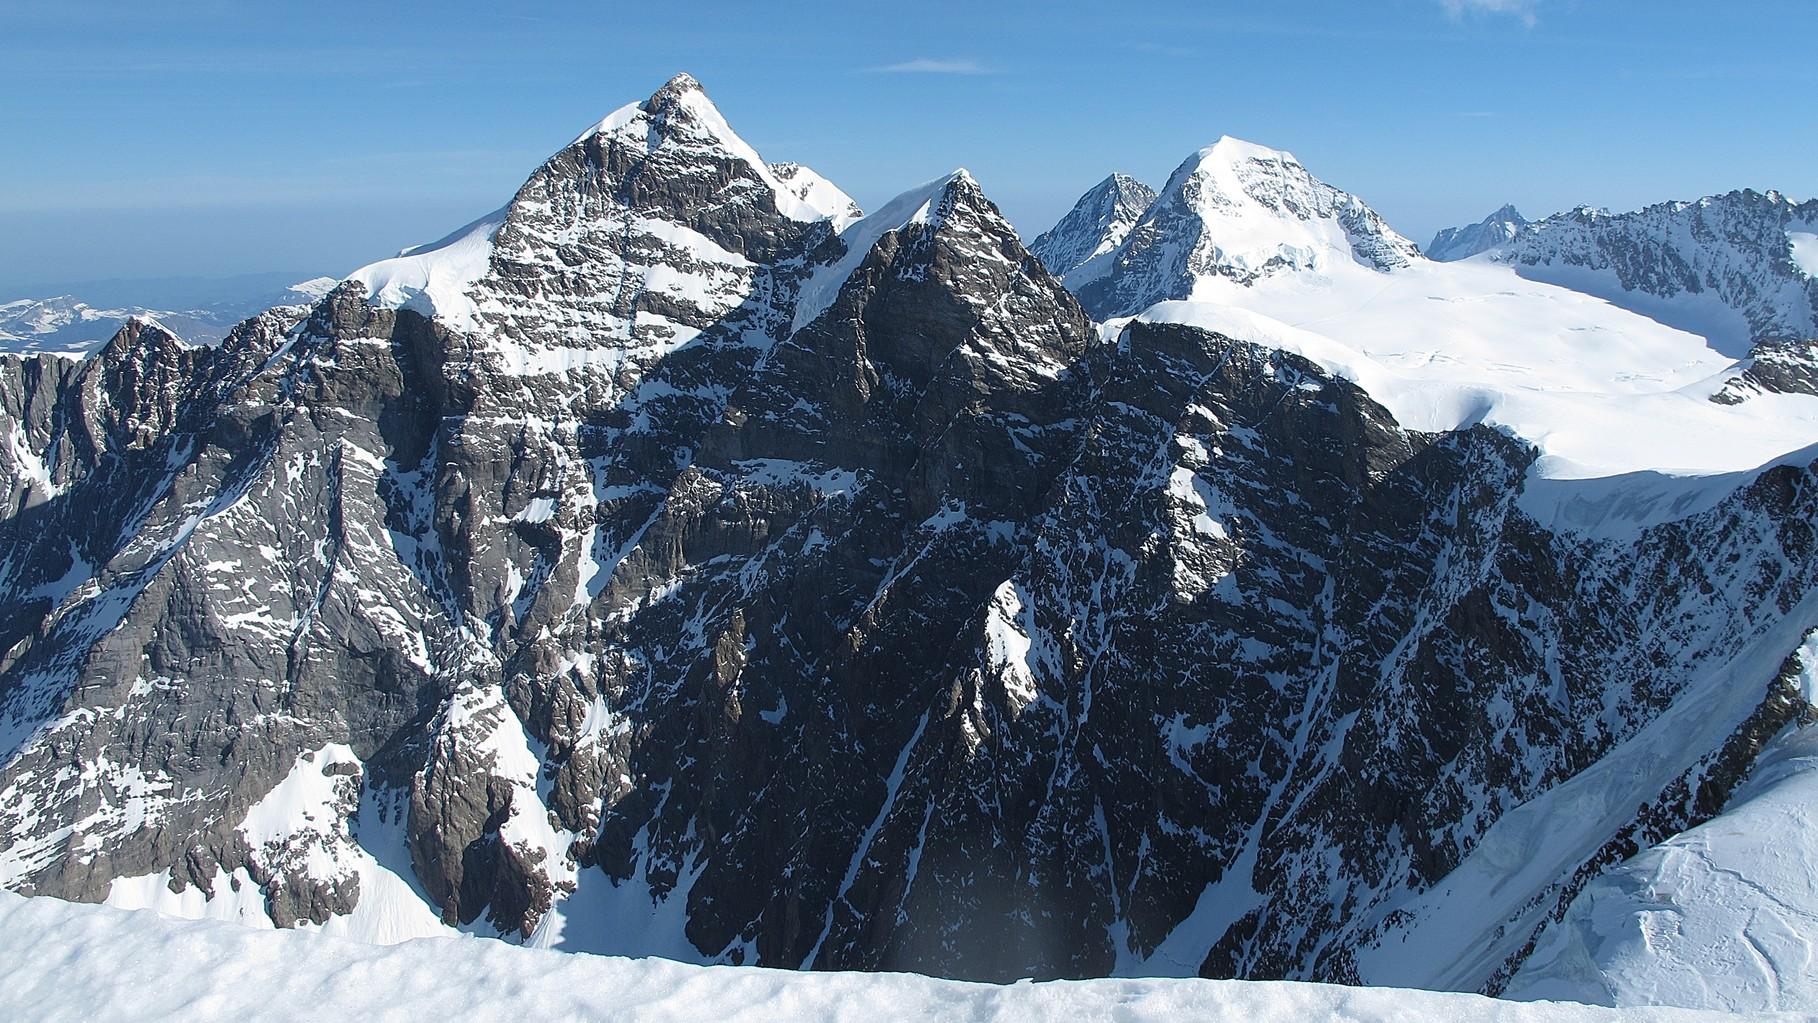 Jungfrau so nah.... dahinter Mönch und Eiger